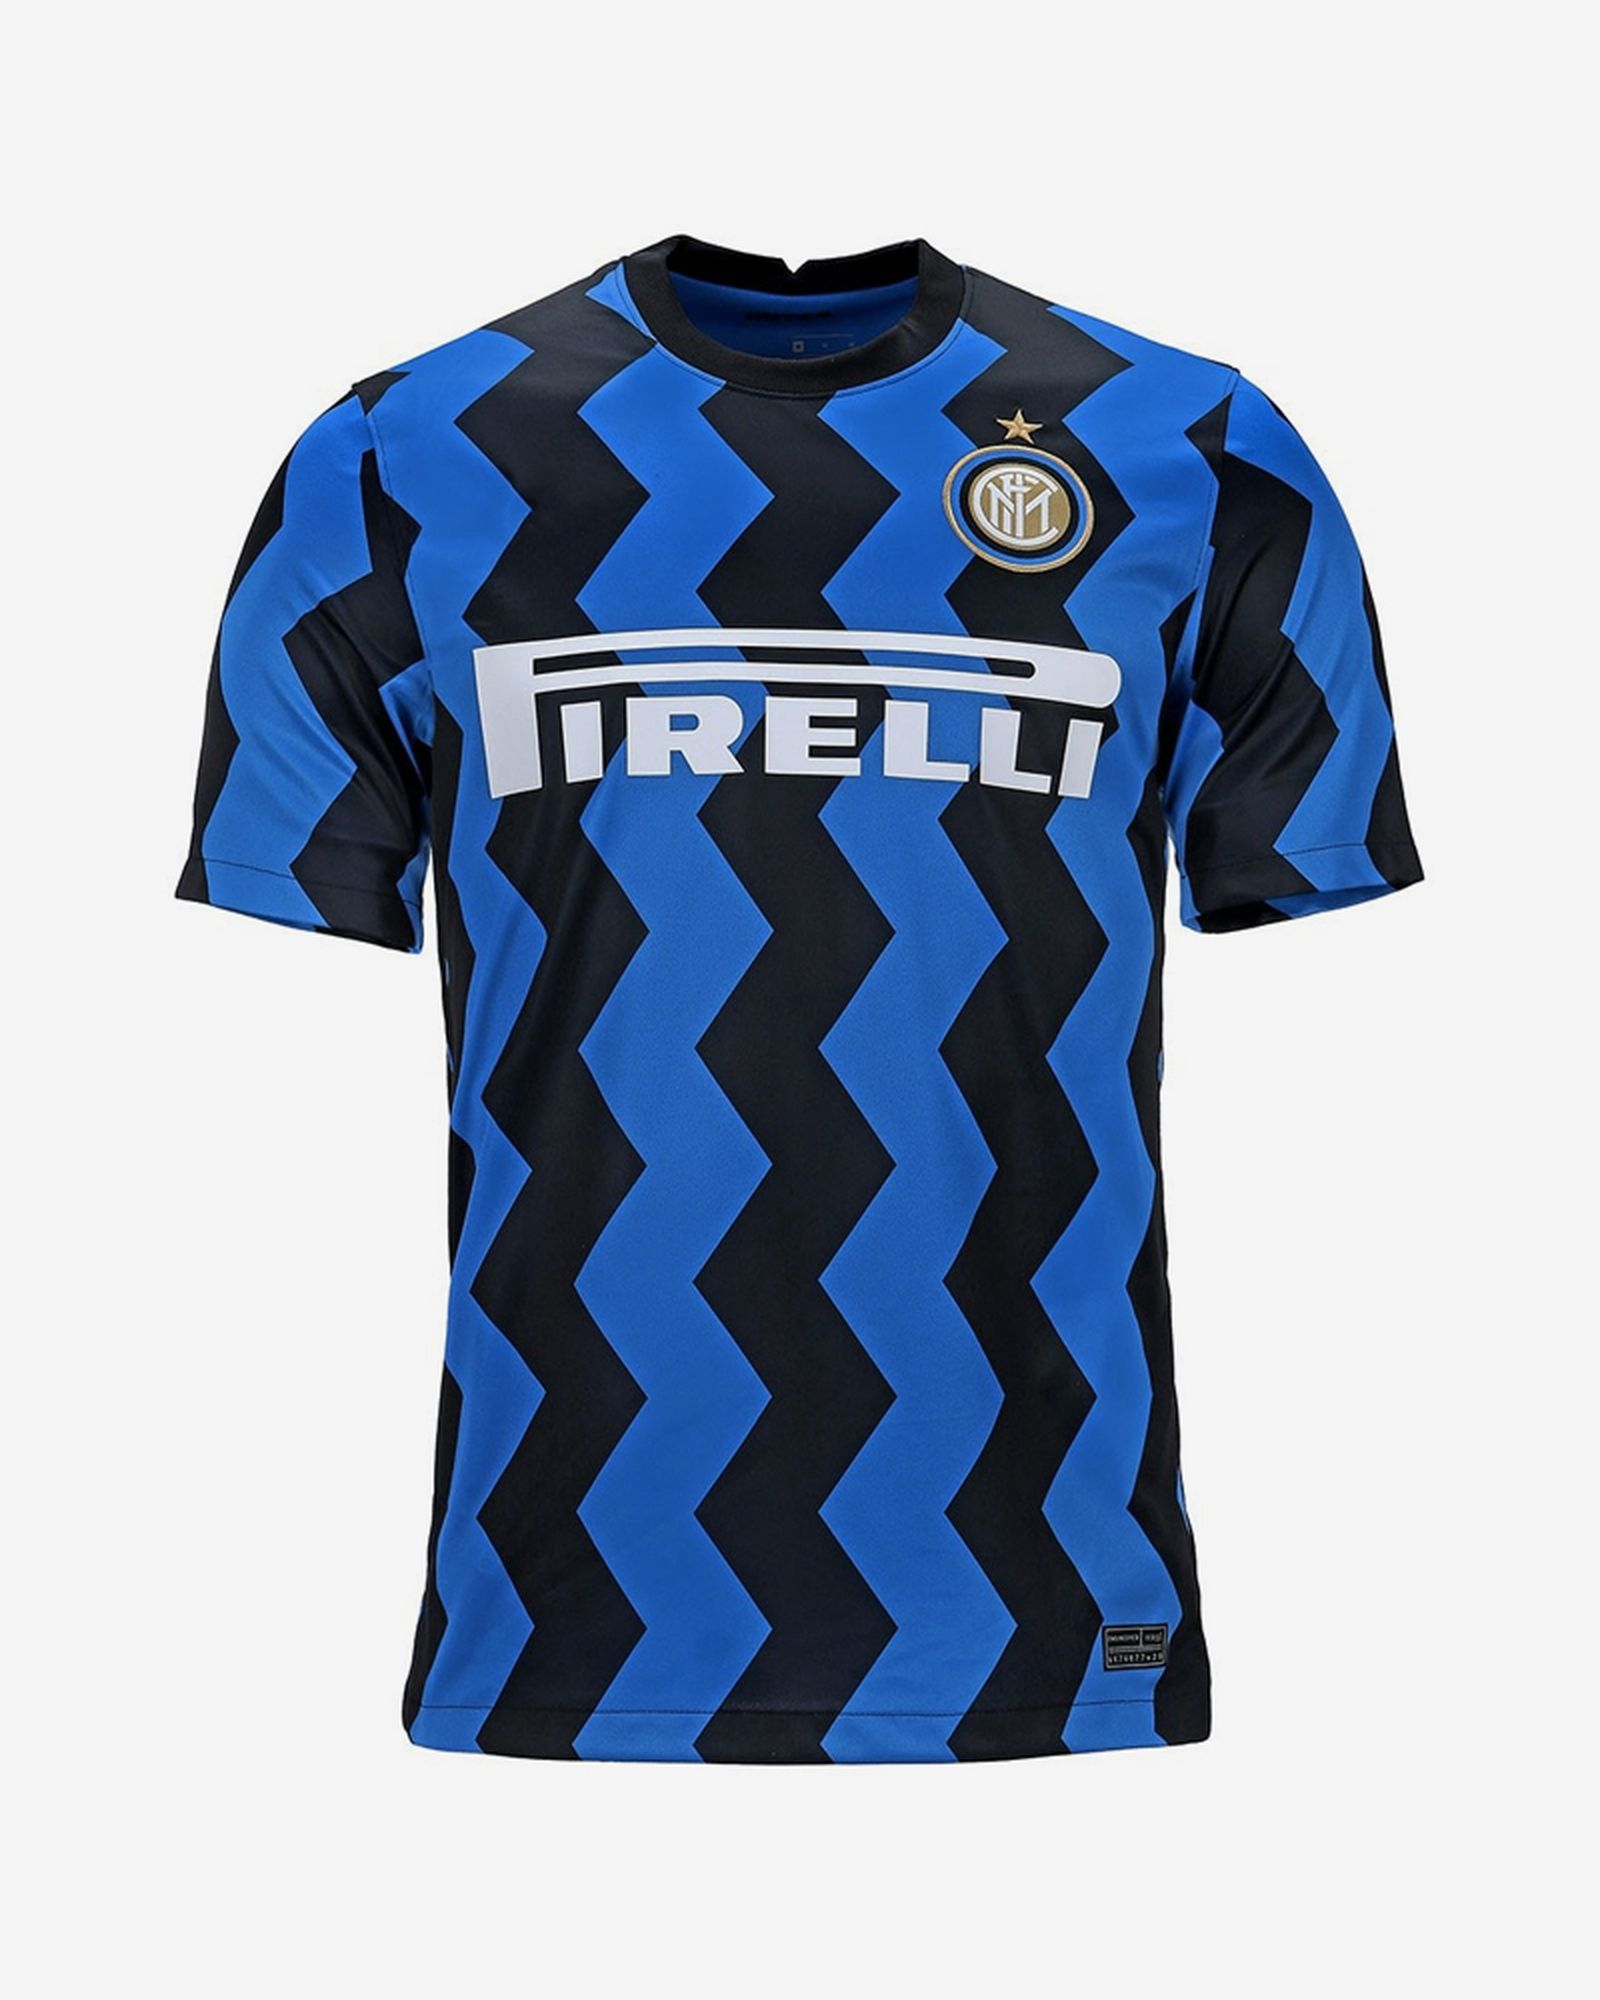 football-shirts-2020-review-07